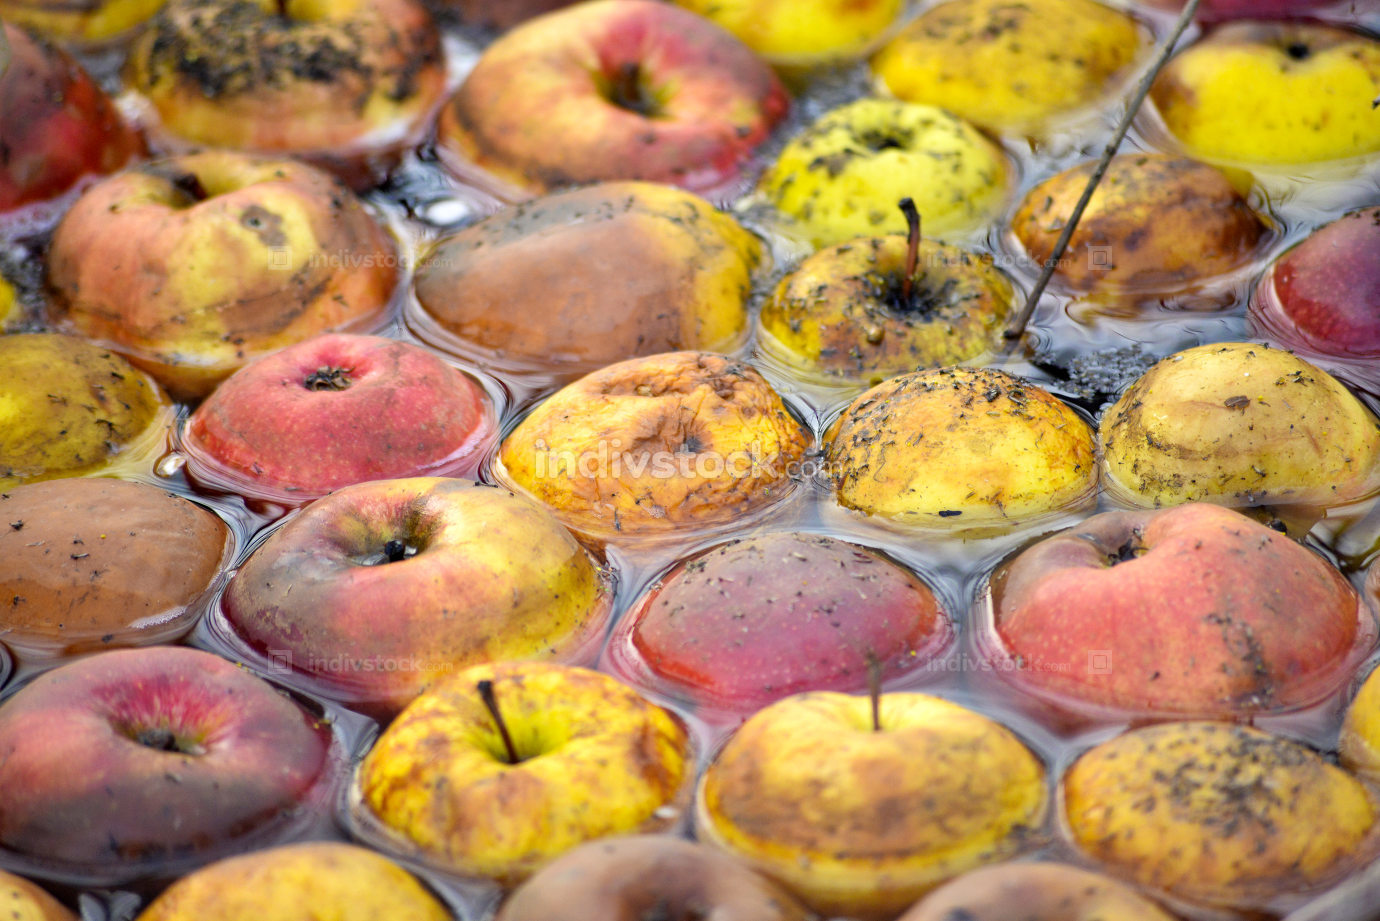 Rotten disgusting apple in a flowing water